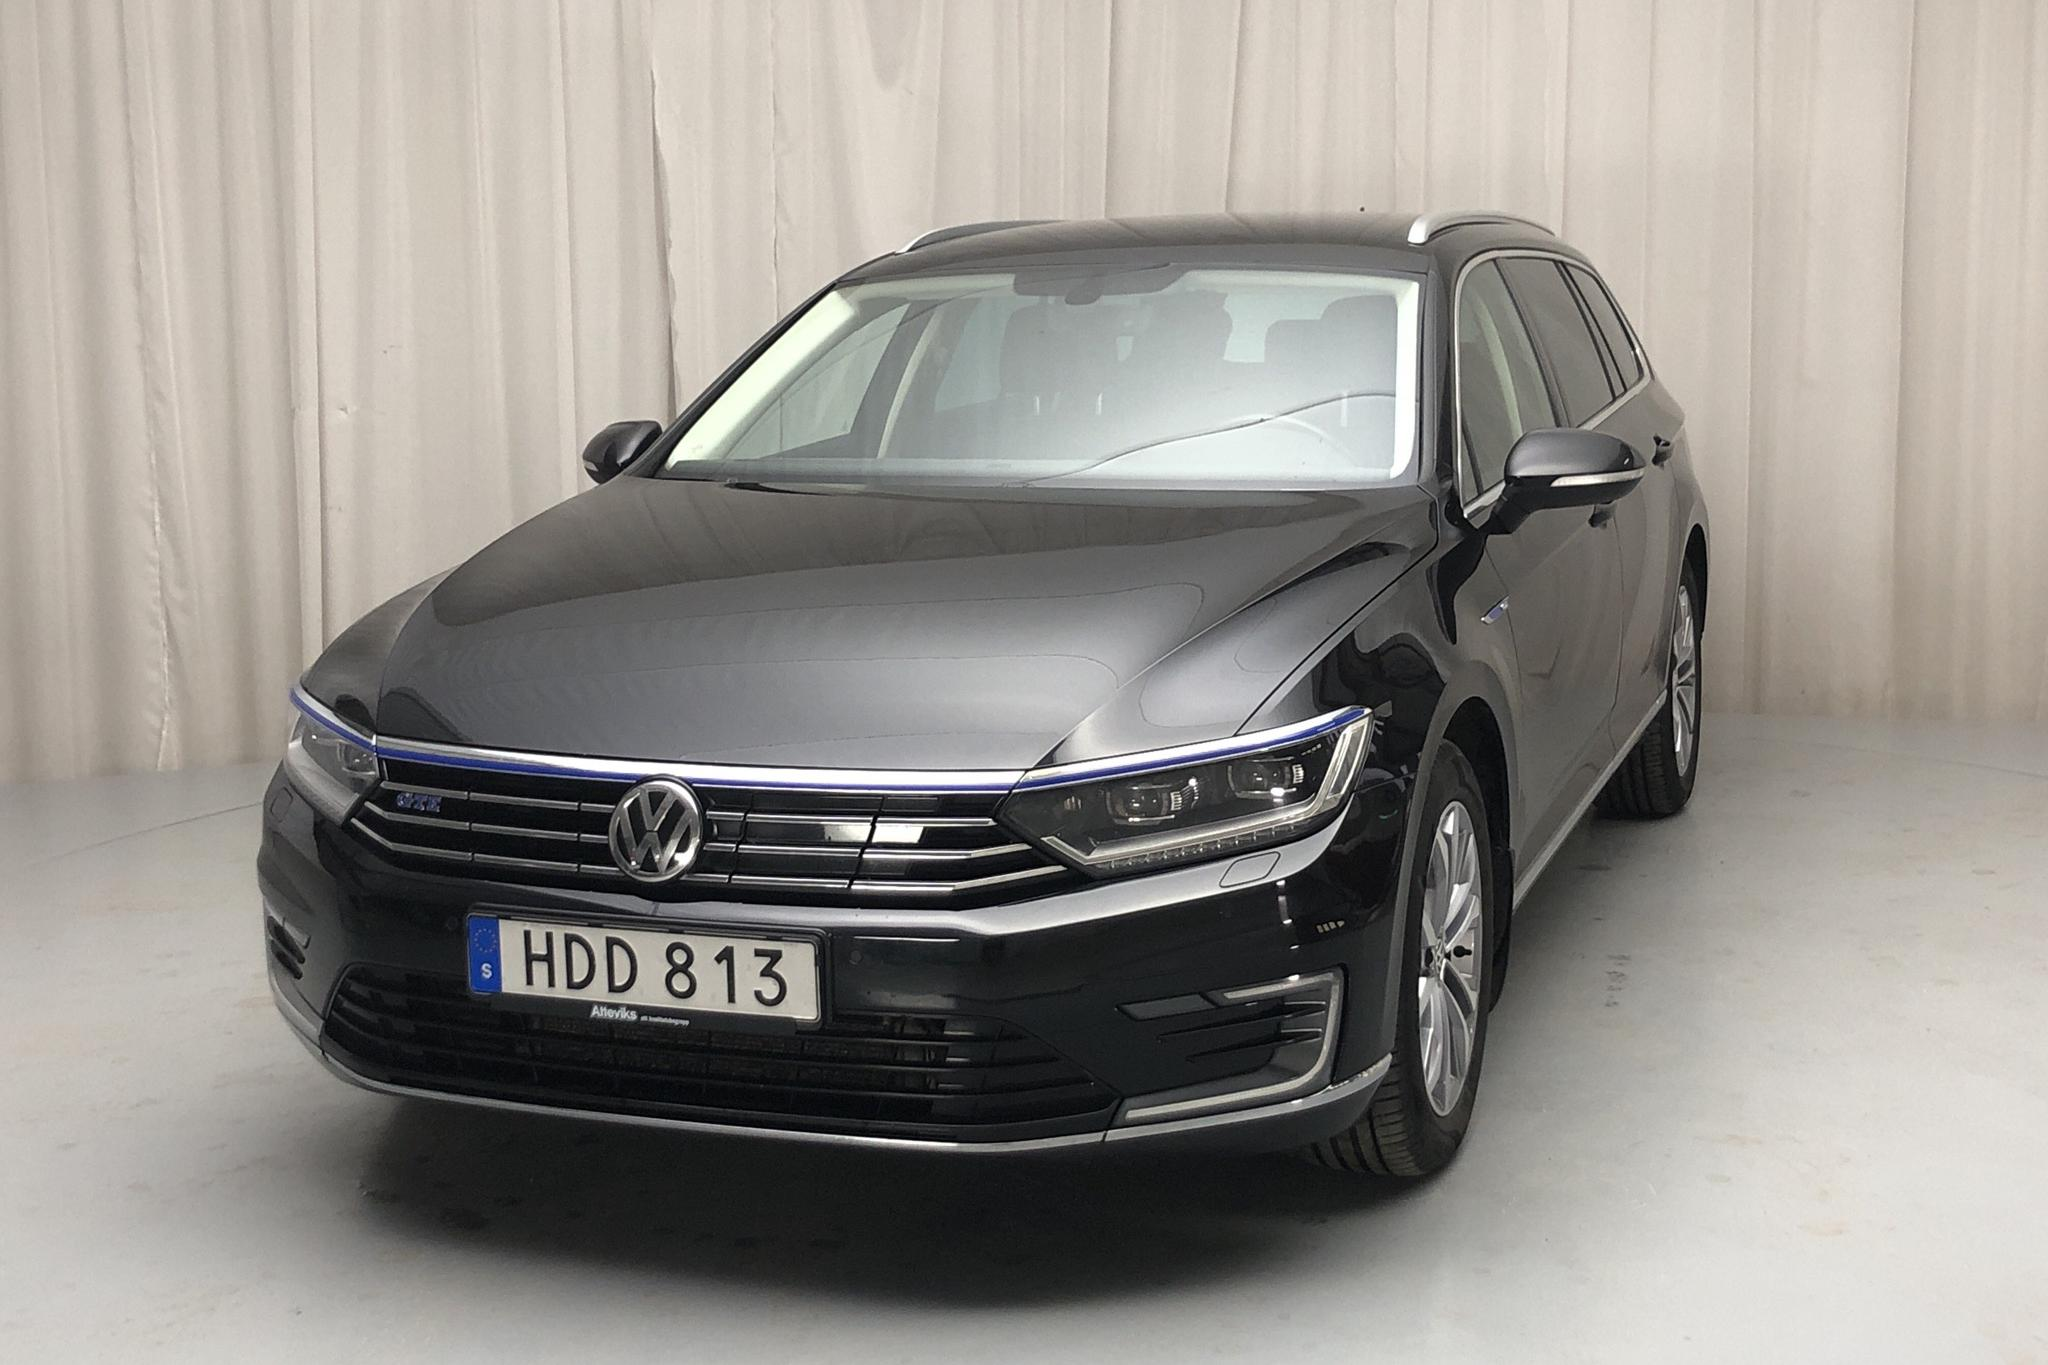 VW Passat 1.4 Plug-in-Hybrid Sportscombi (218hk) - 173 010 km - Automatic - black - 2017